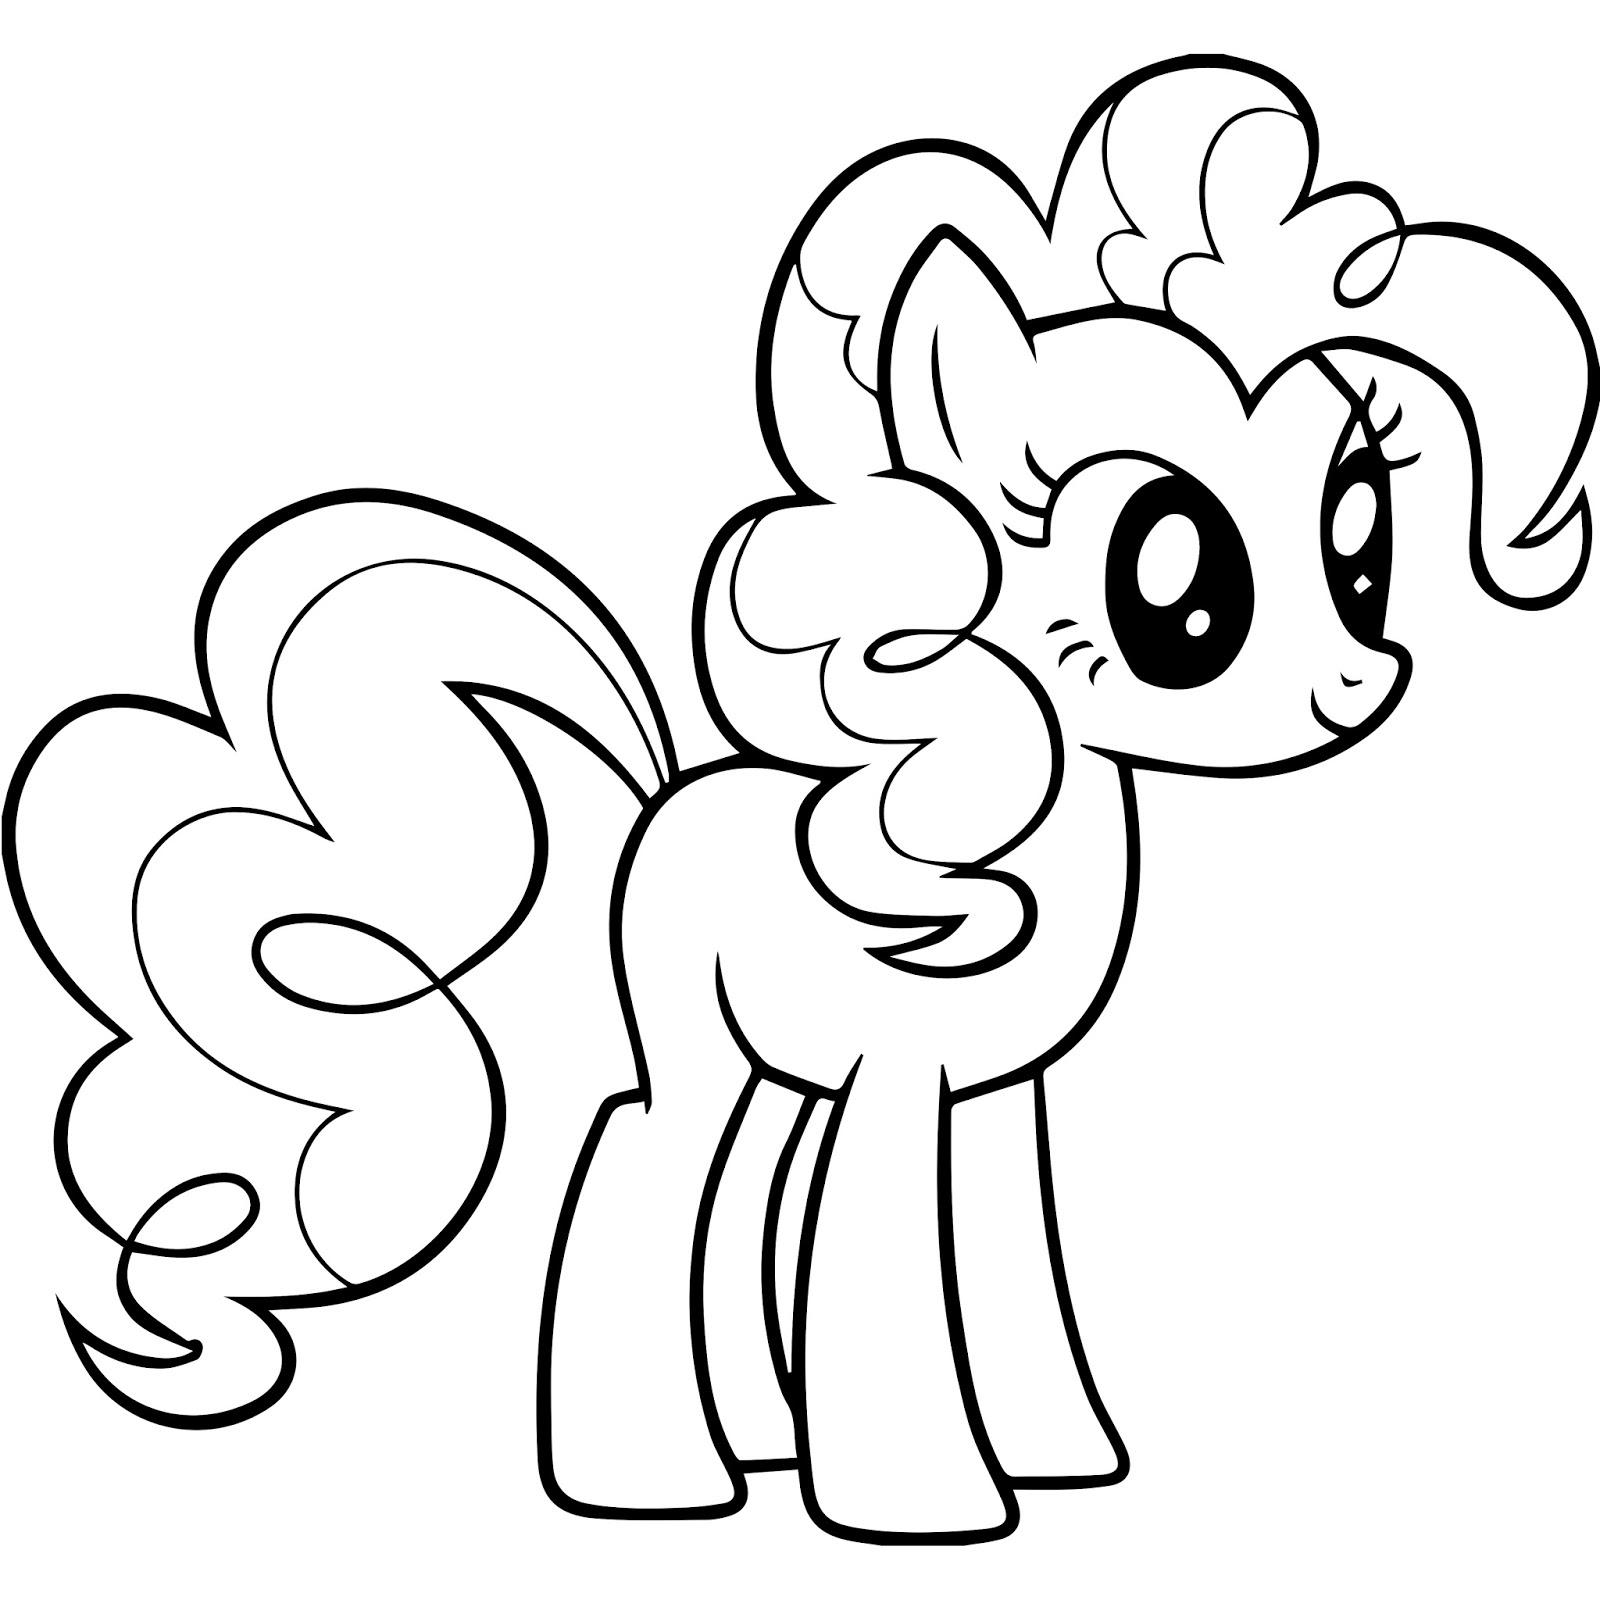 my+little+pony+coloring+pages 1,600×1,600 pixels